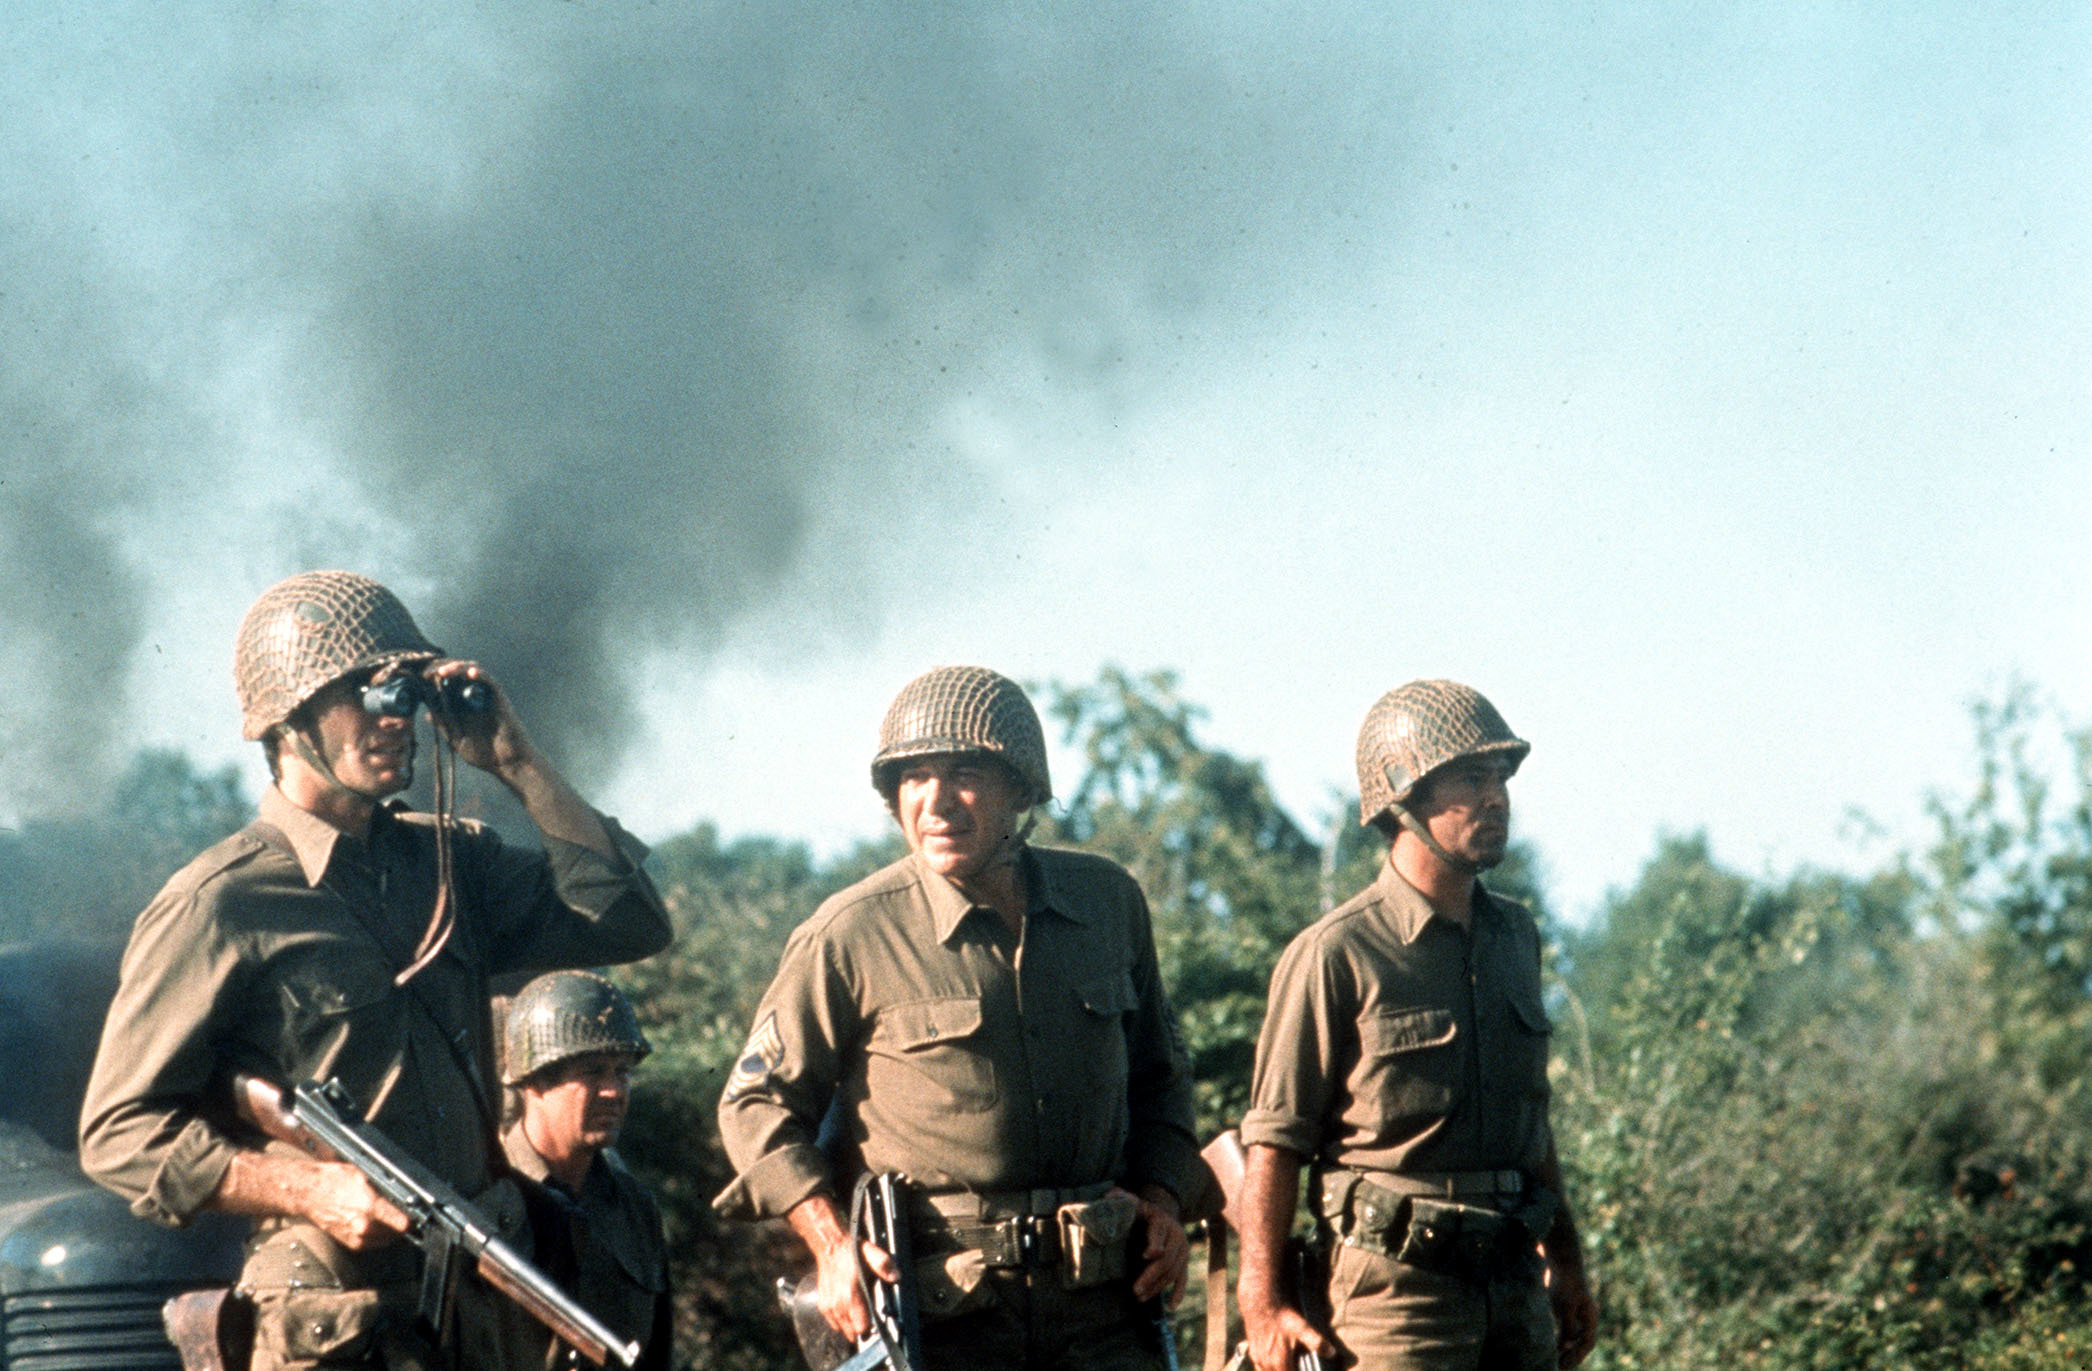 Best World War II Movies | 50 Brilliant WWII Films To Watch